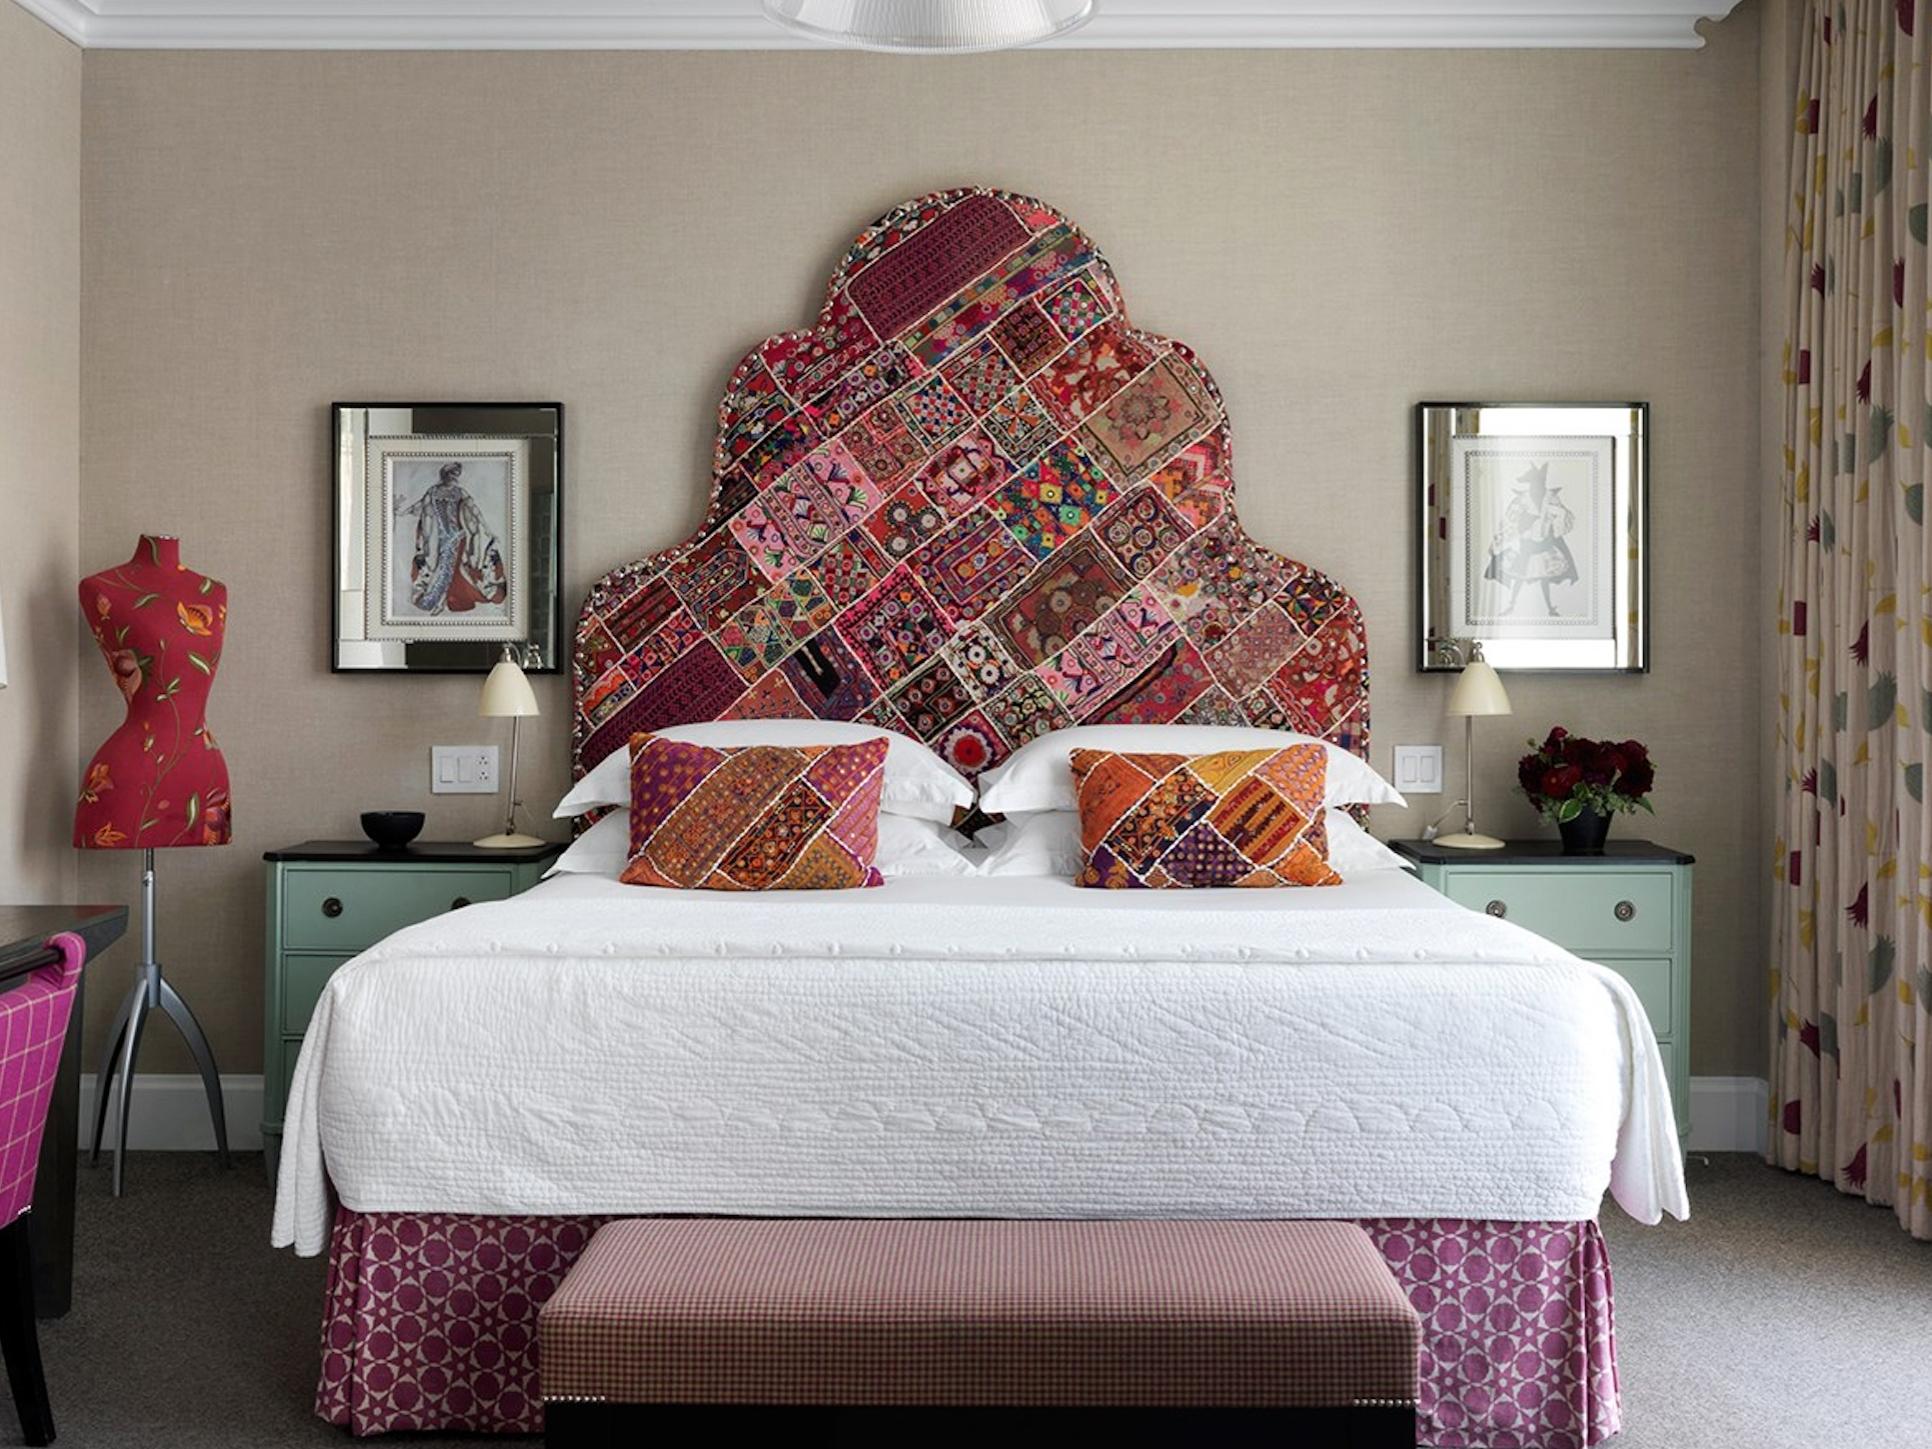 Бутик отели - Мода, дизайн, атмосфера